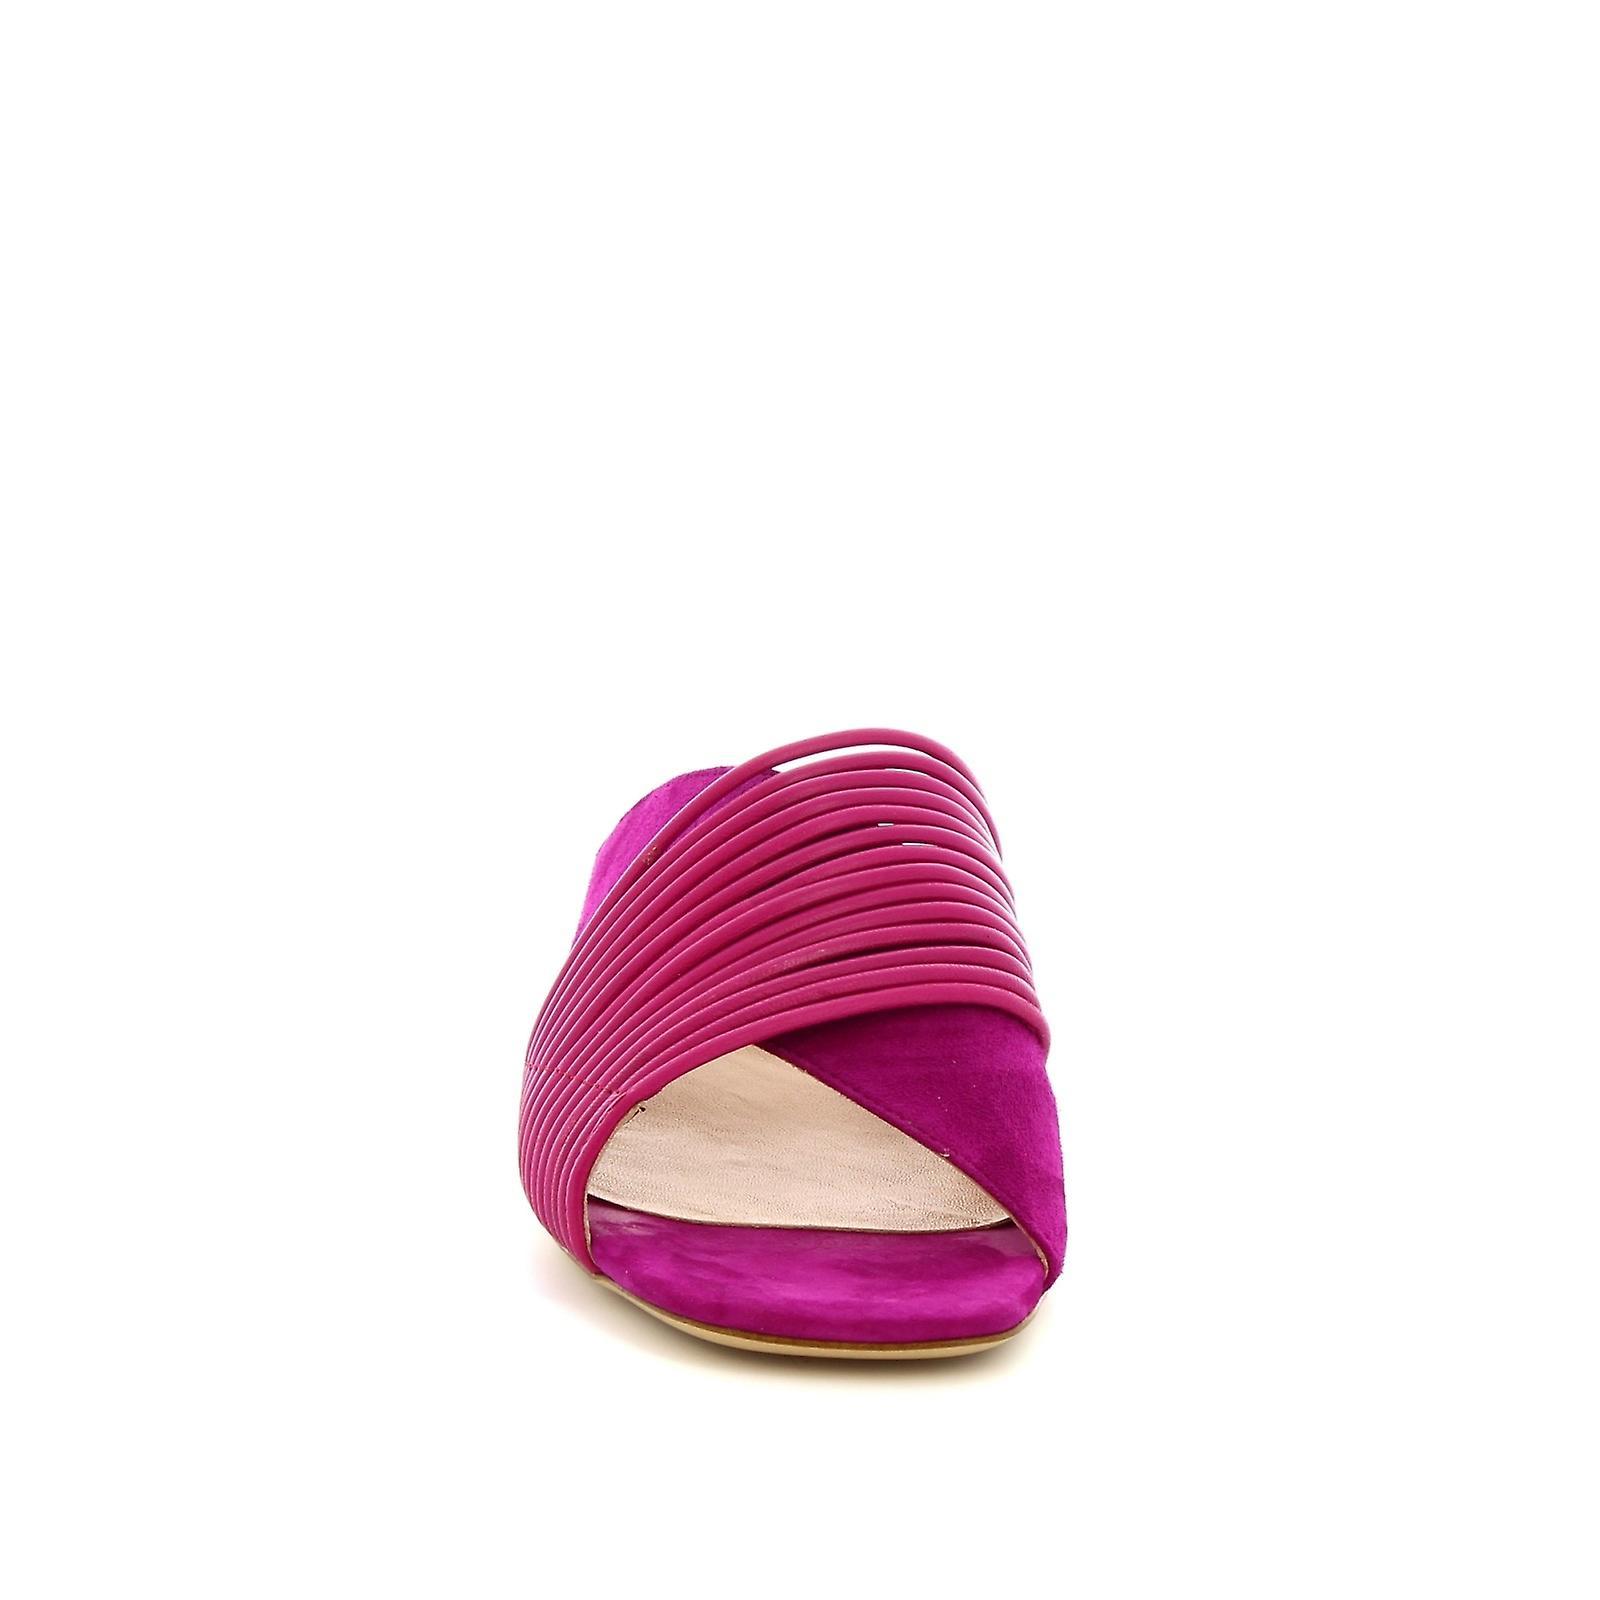 Leonardo Shoes Women's handmade low heel sandals slippers in fuchsia suede